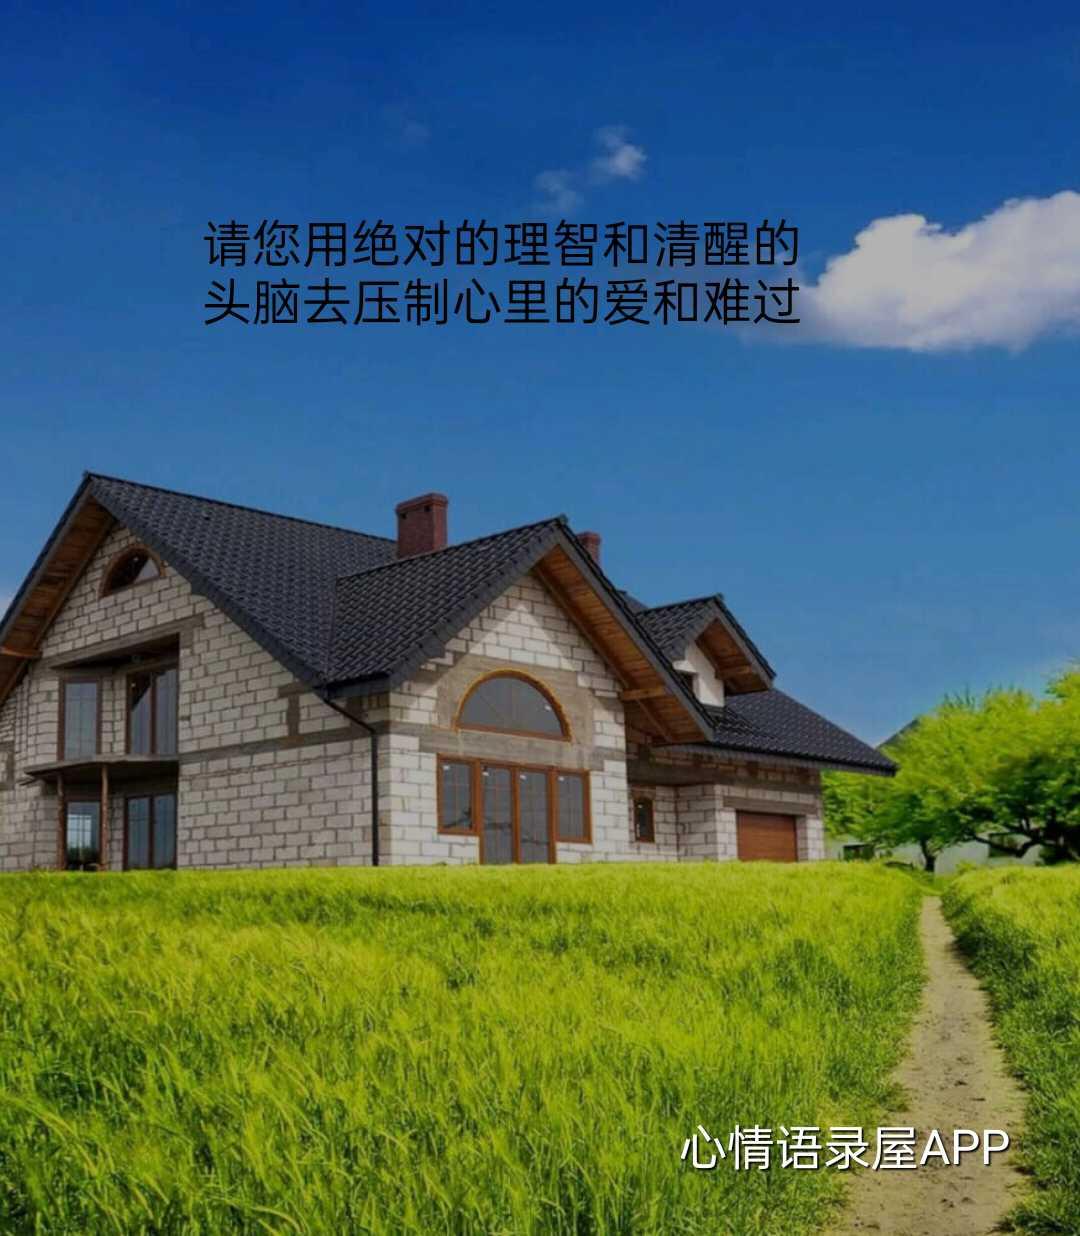 http://www.58100.com/index/detail/763061